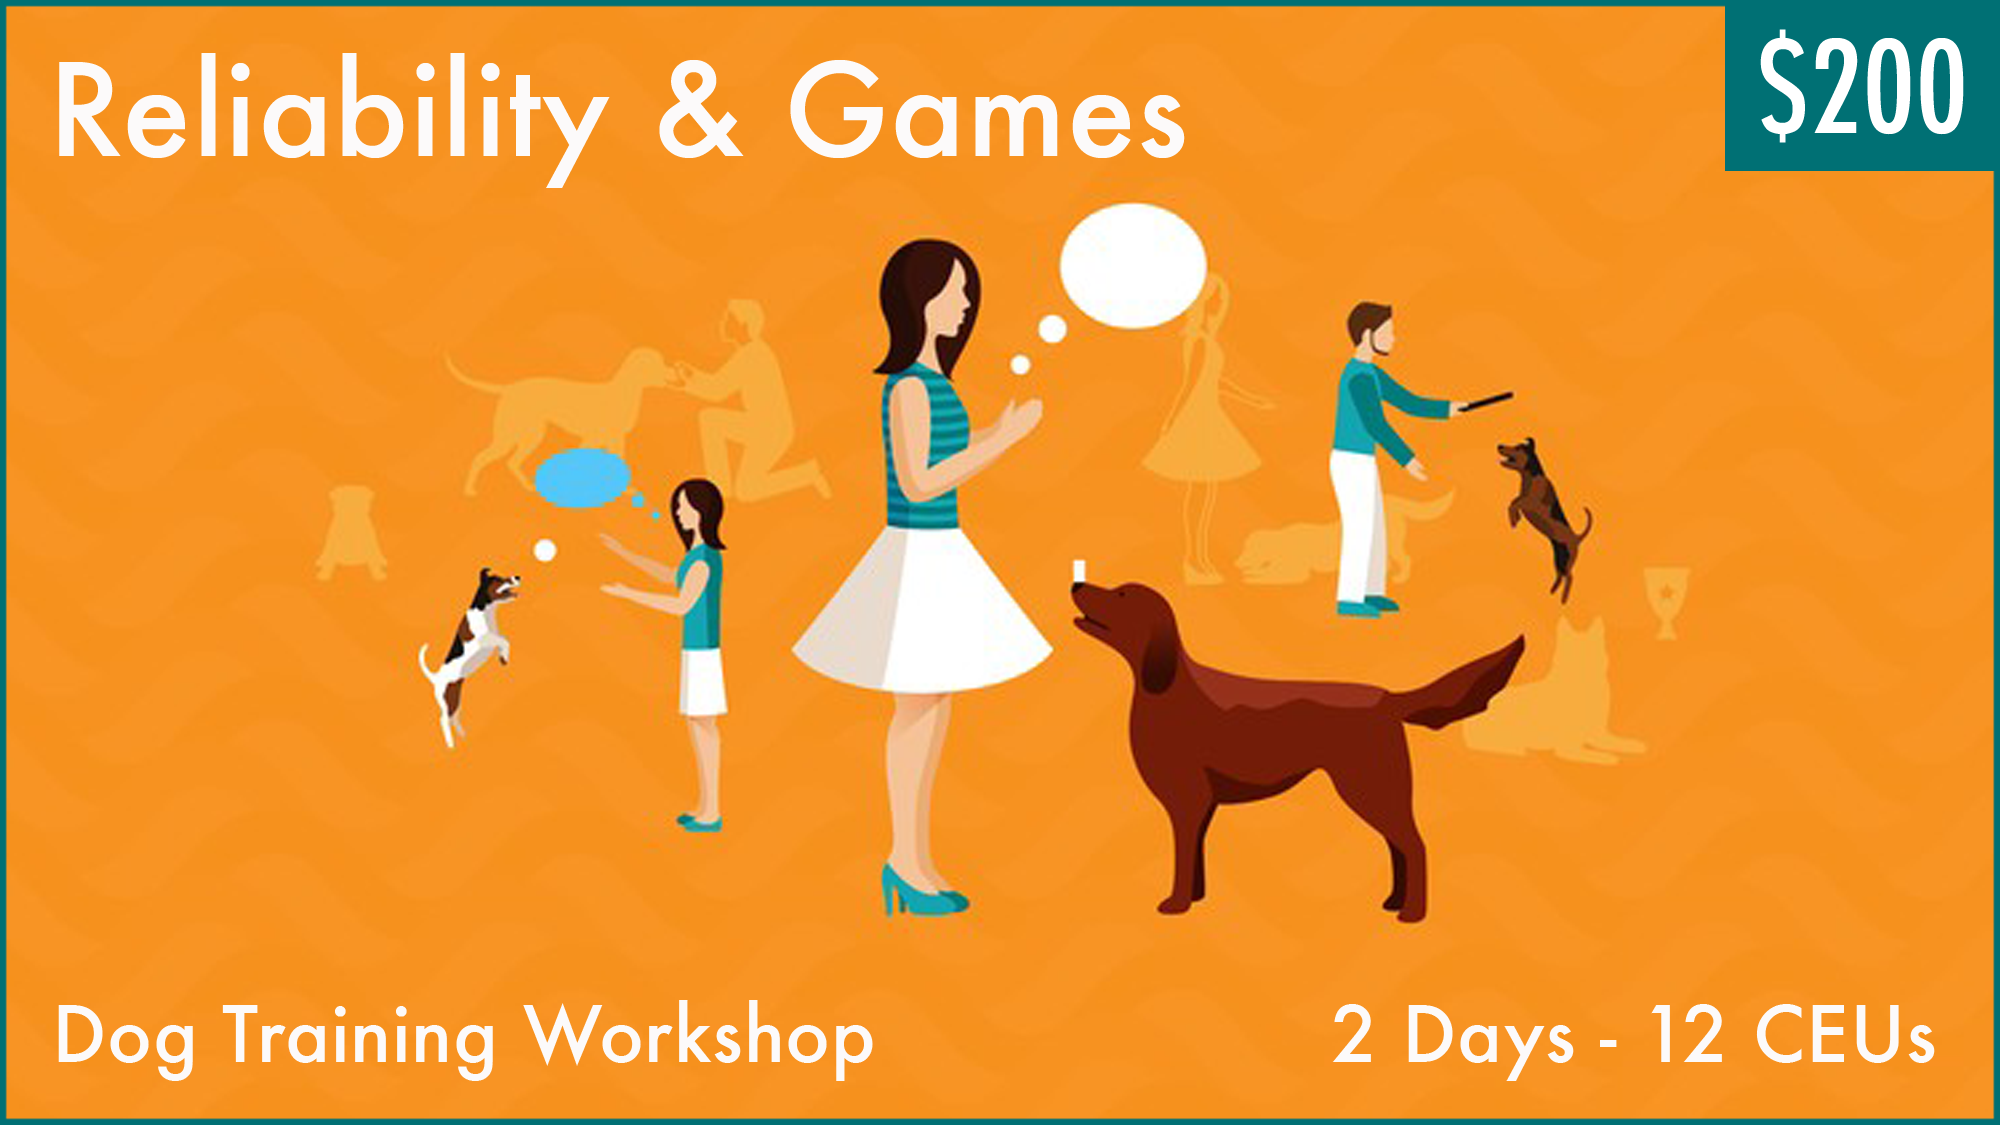 Reliability & Games 2-Day Dog Training Workshop